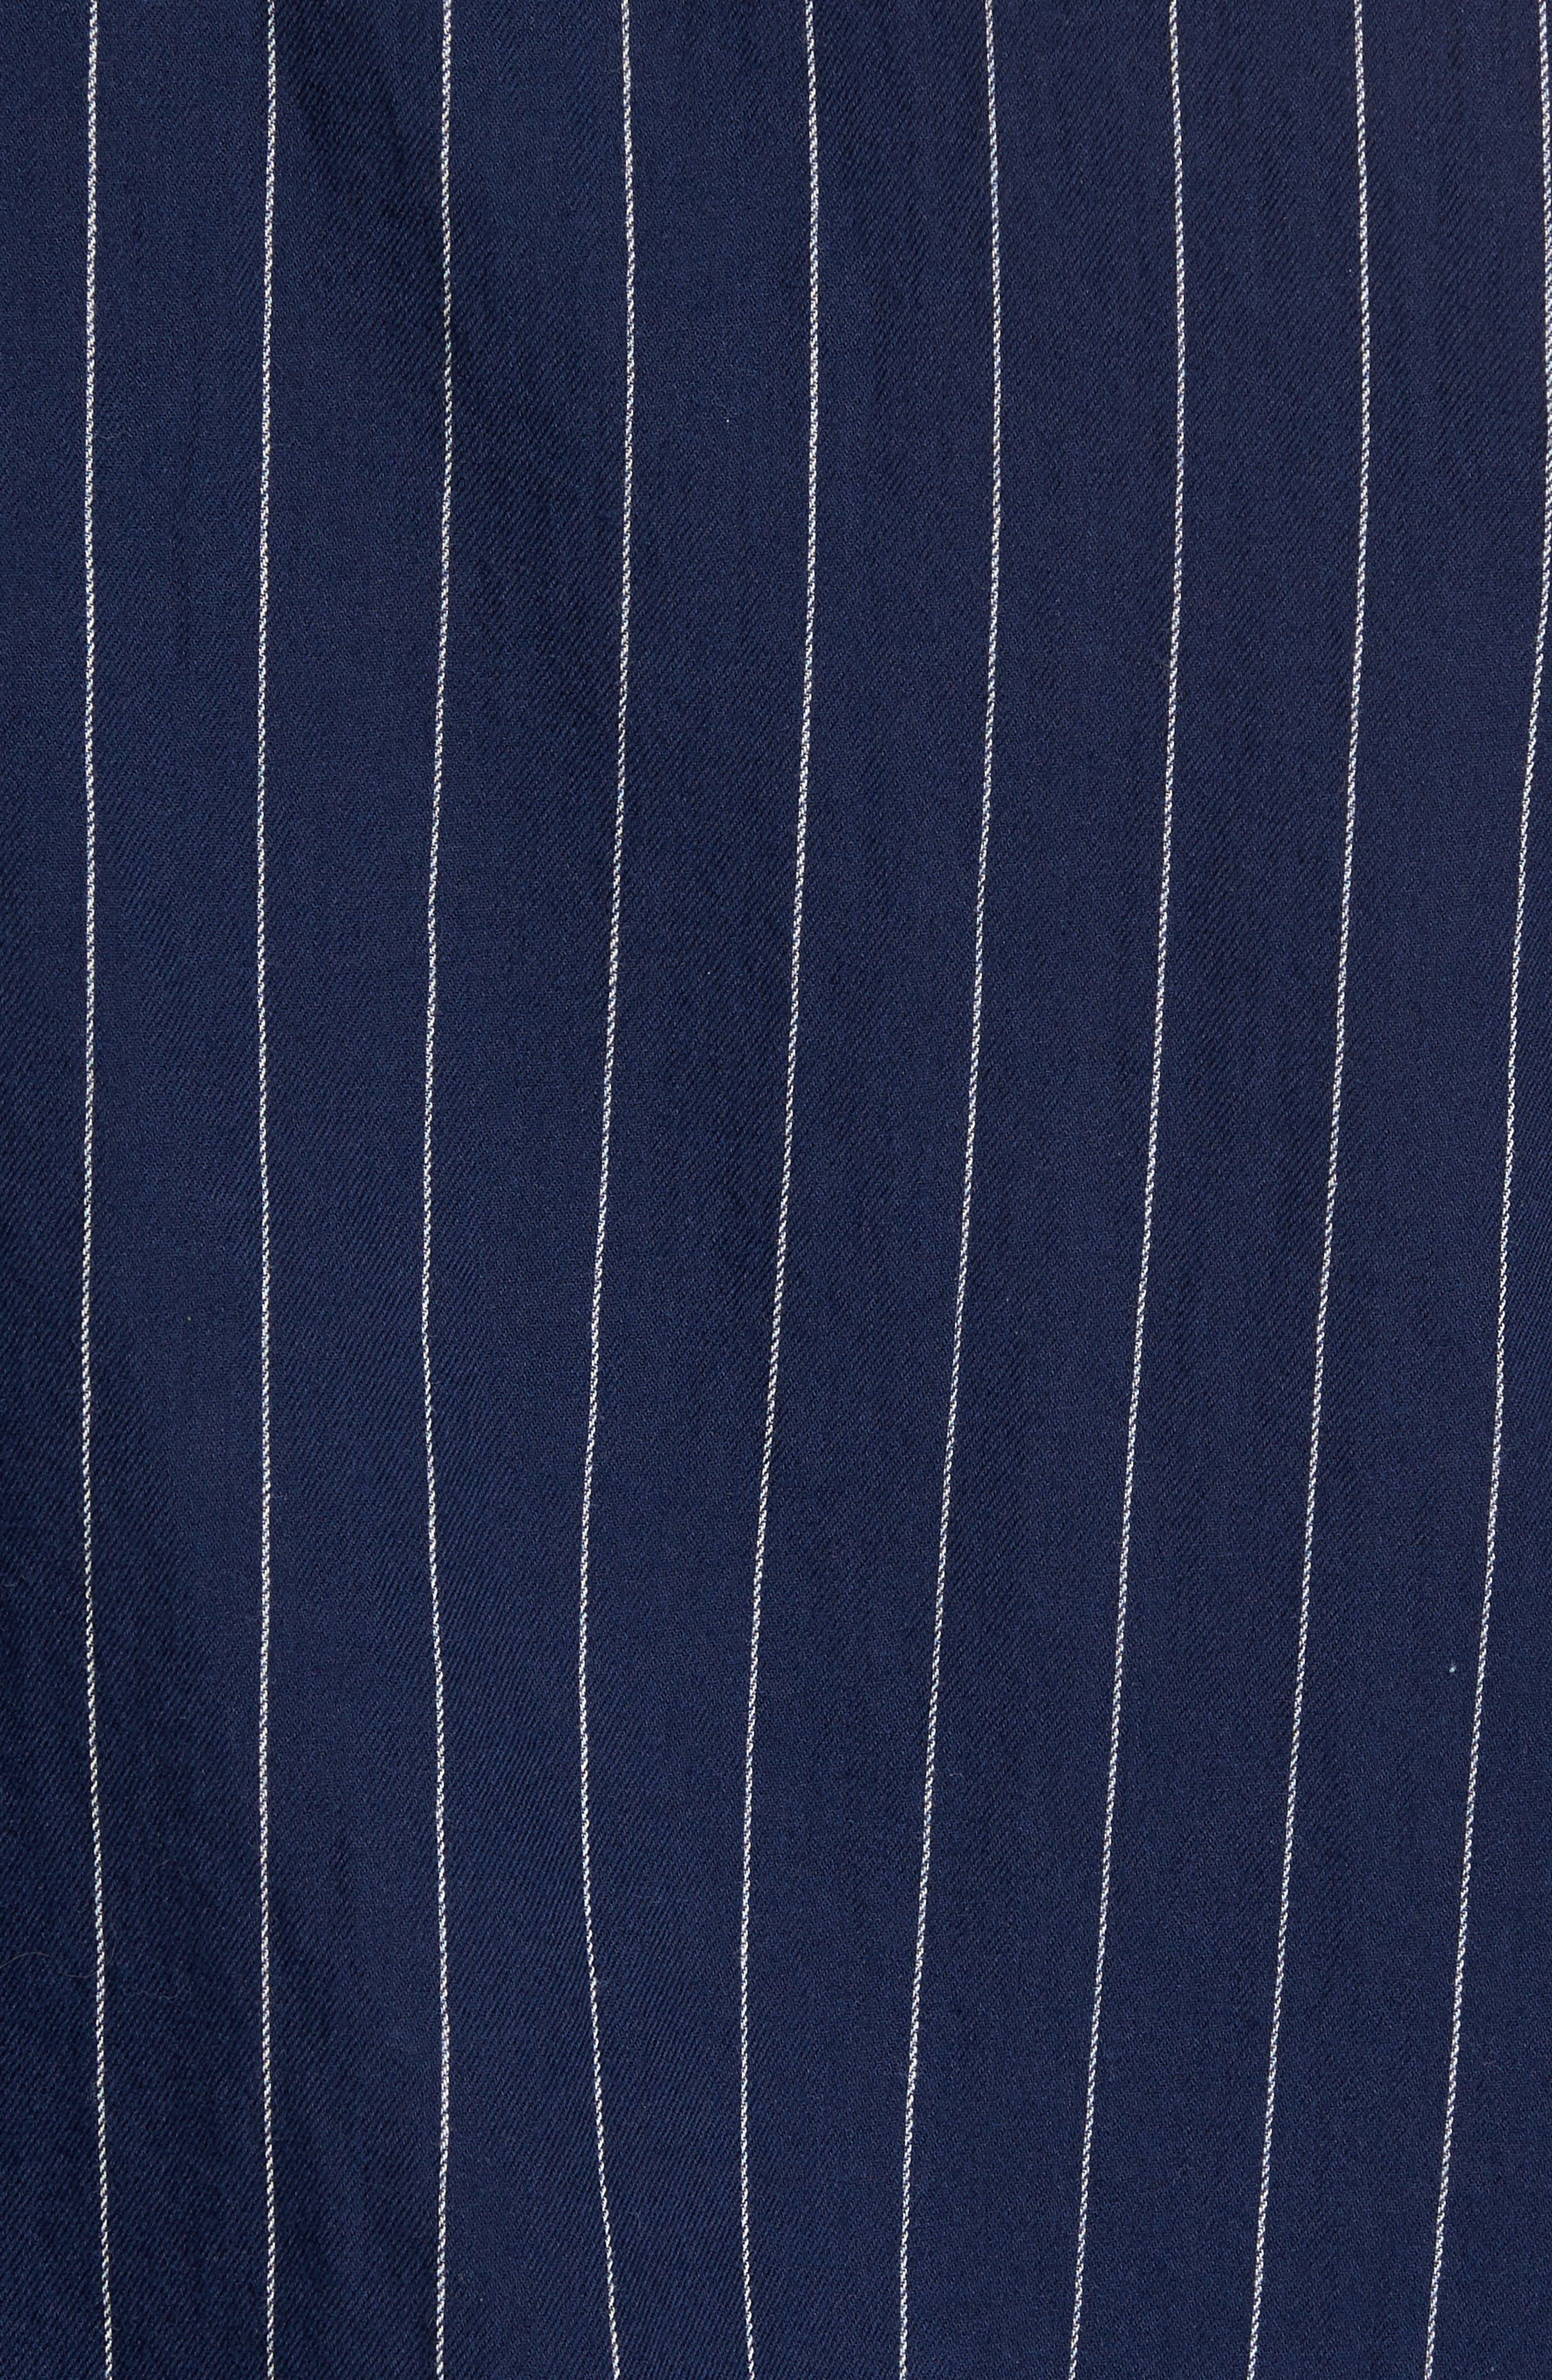 Stripe Twill Shirt,                             Alternate thumbnail 9, color,